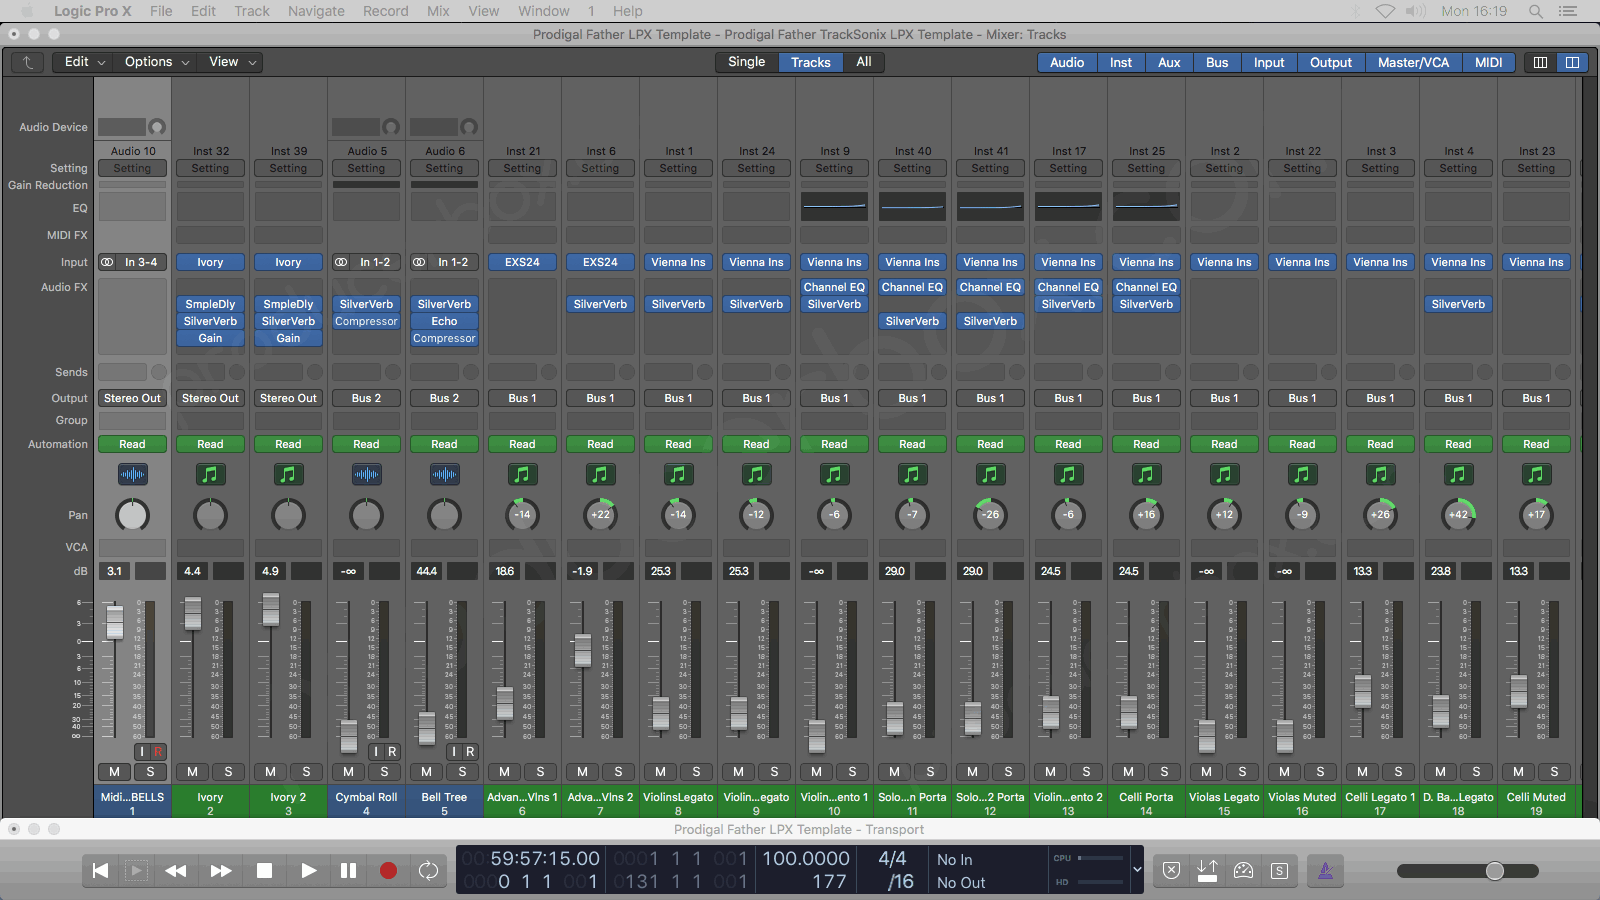 Logic Pro Mixer Preview #1